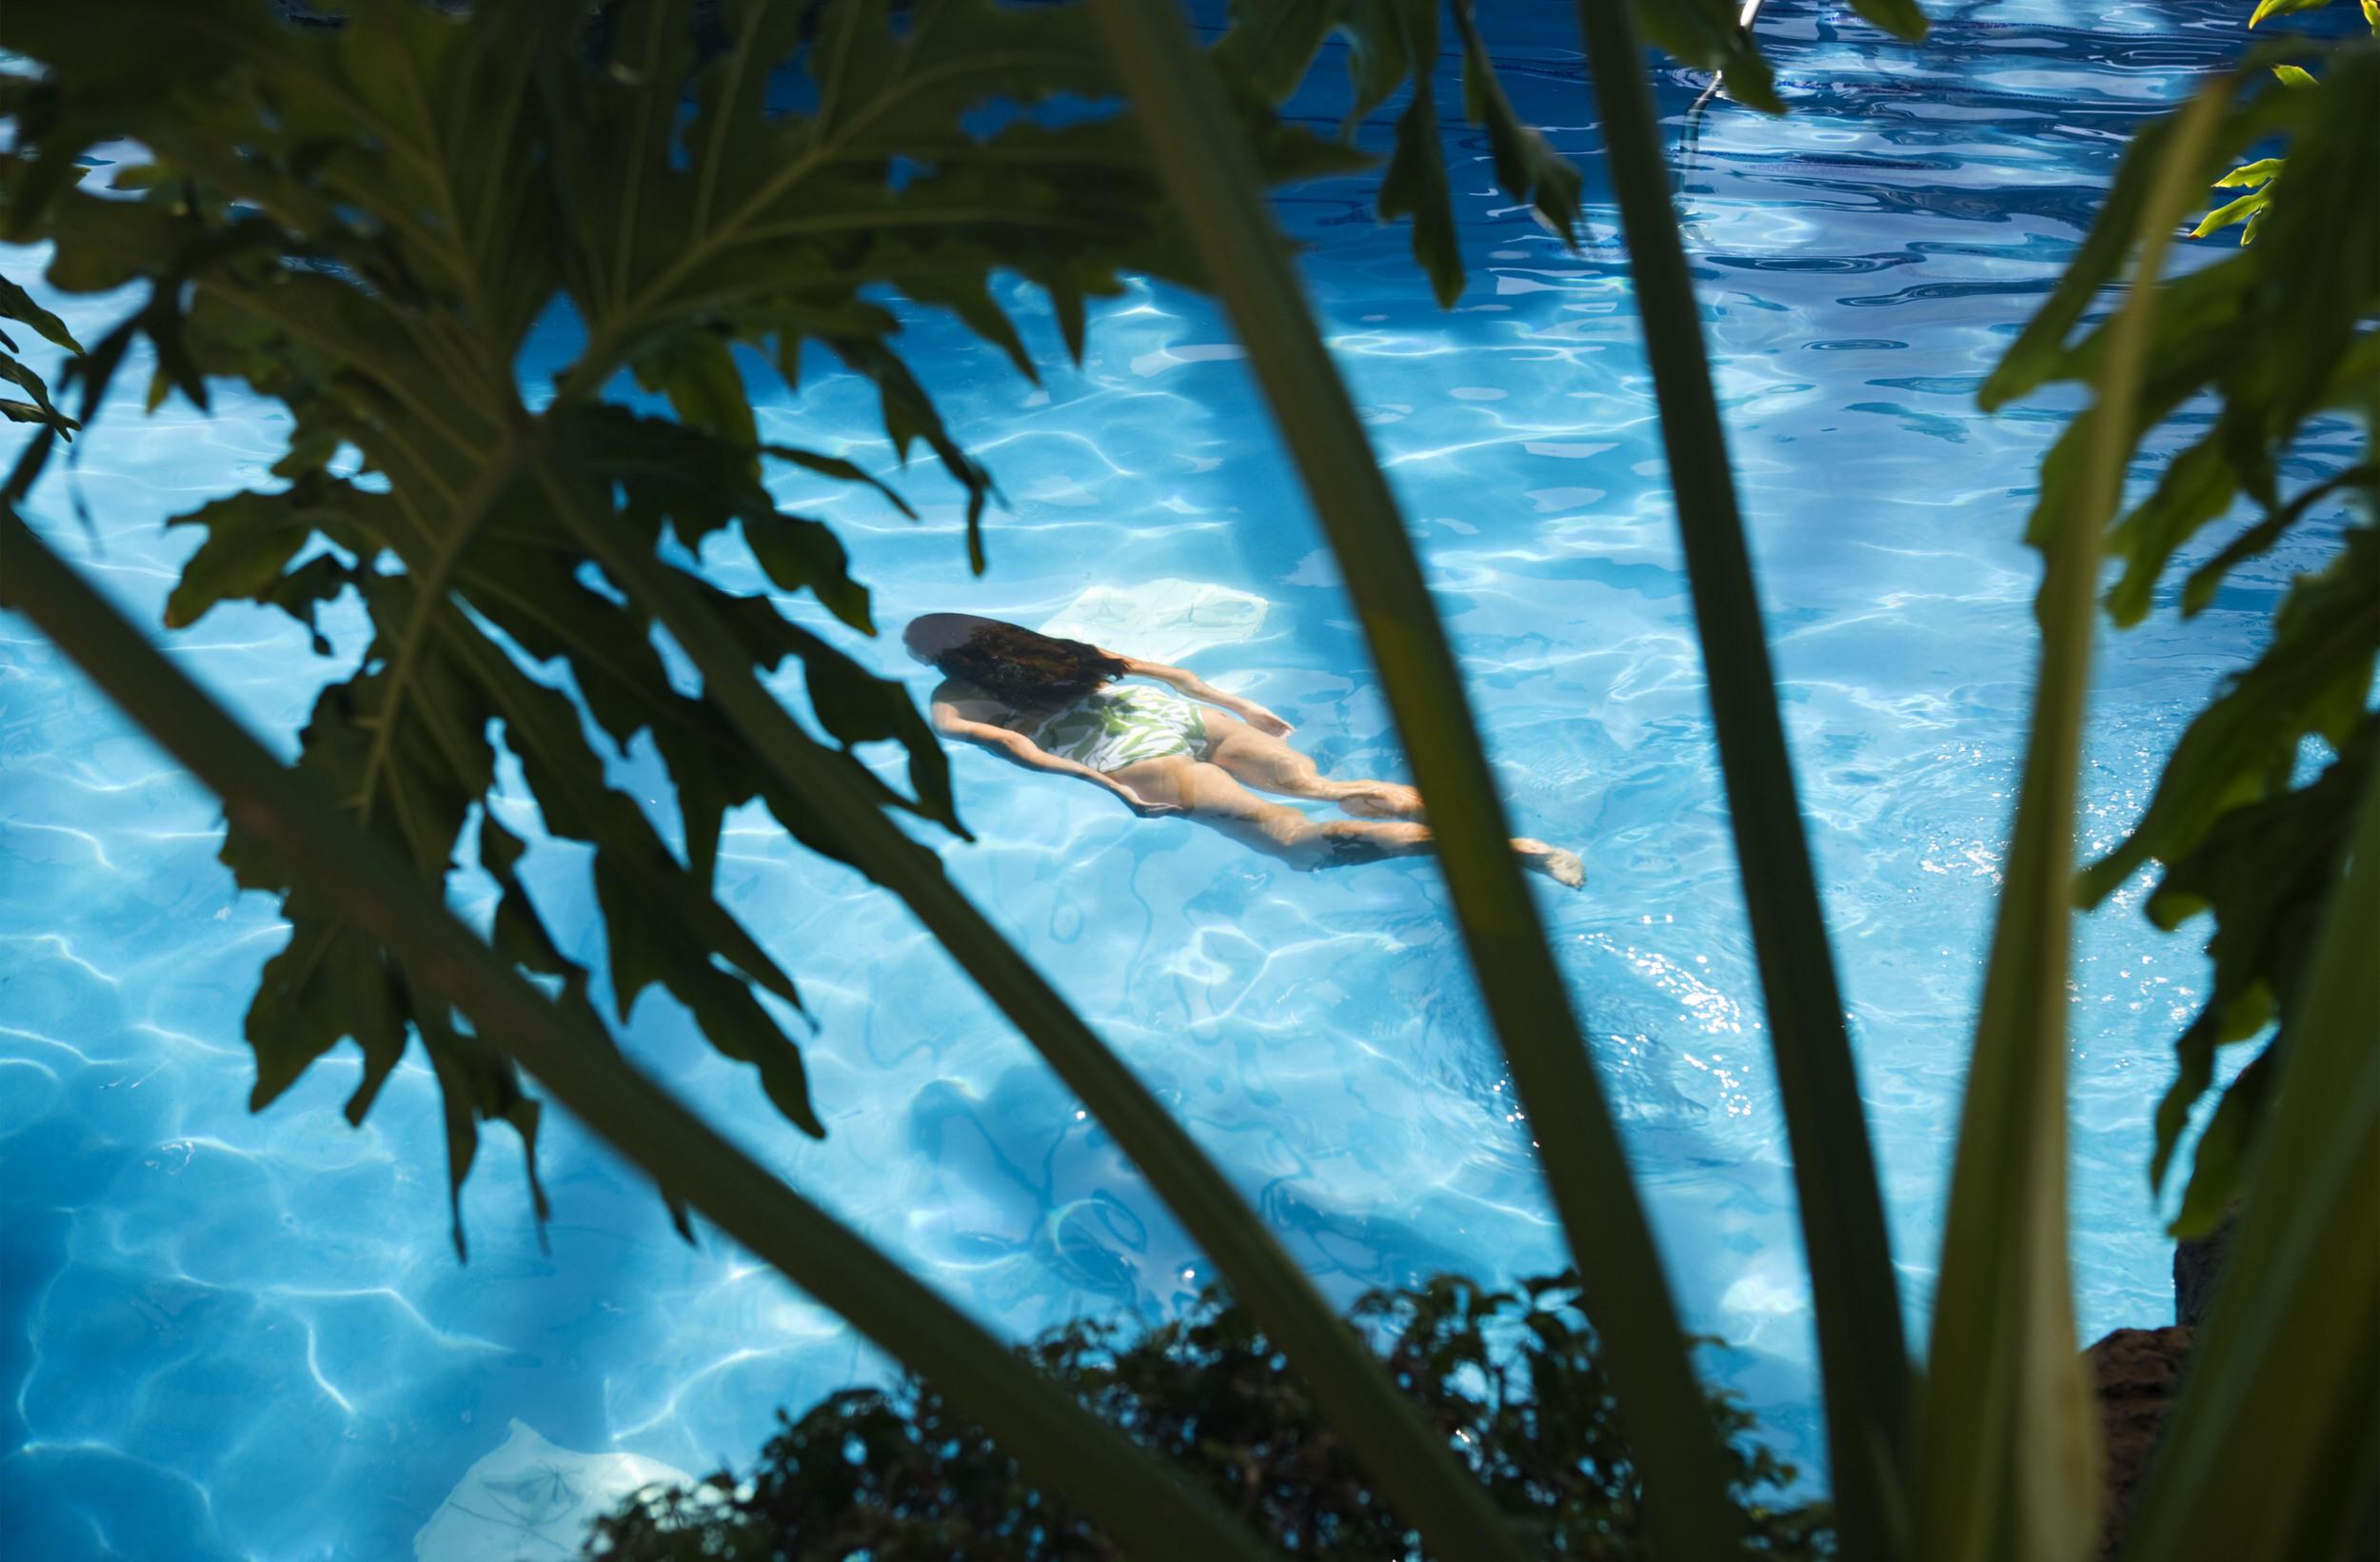 01_07210 Portfolio print swimming for wall 10x16 Sanders07140_1216_152523_HRM.jpg